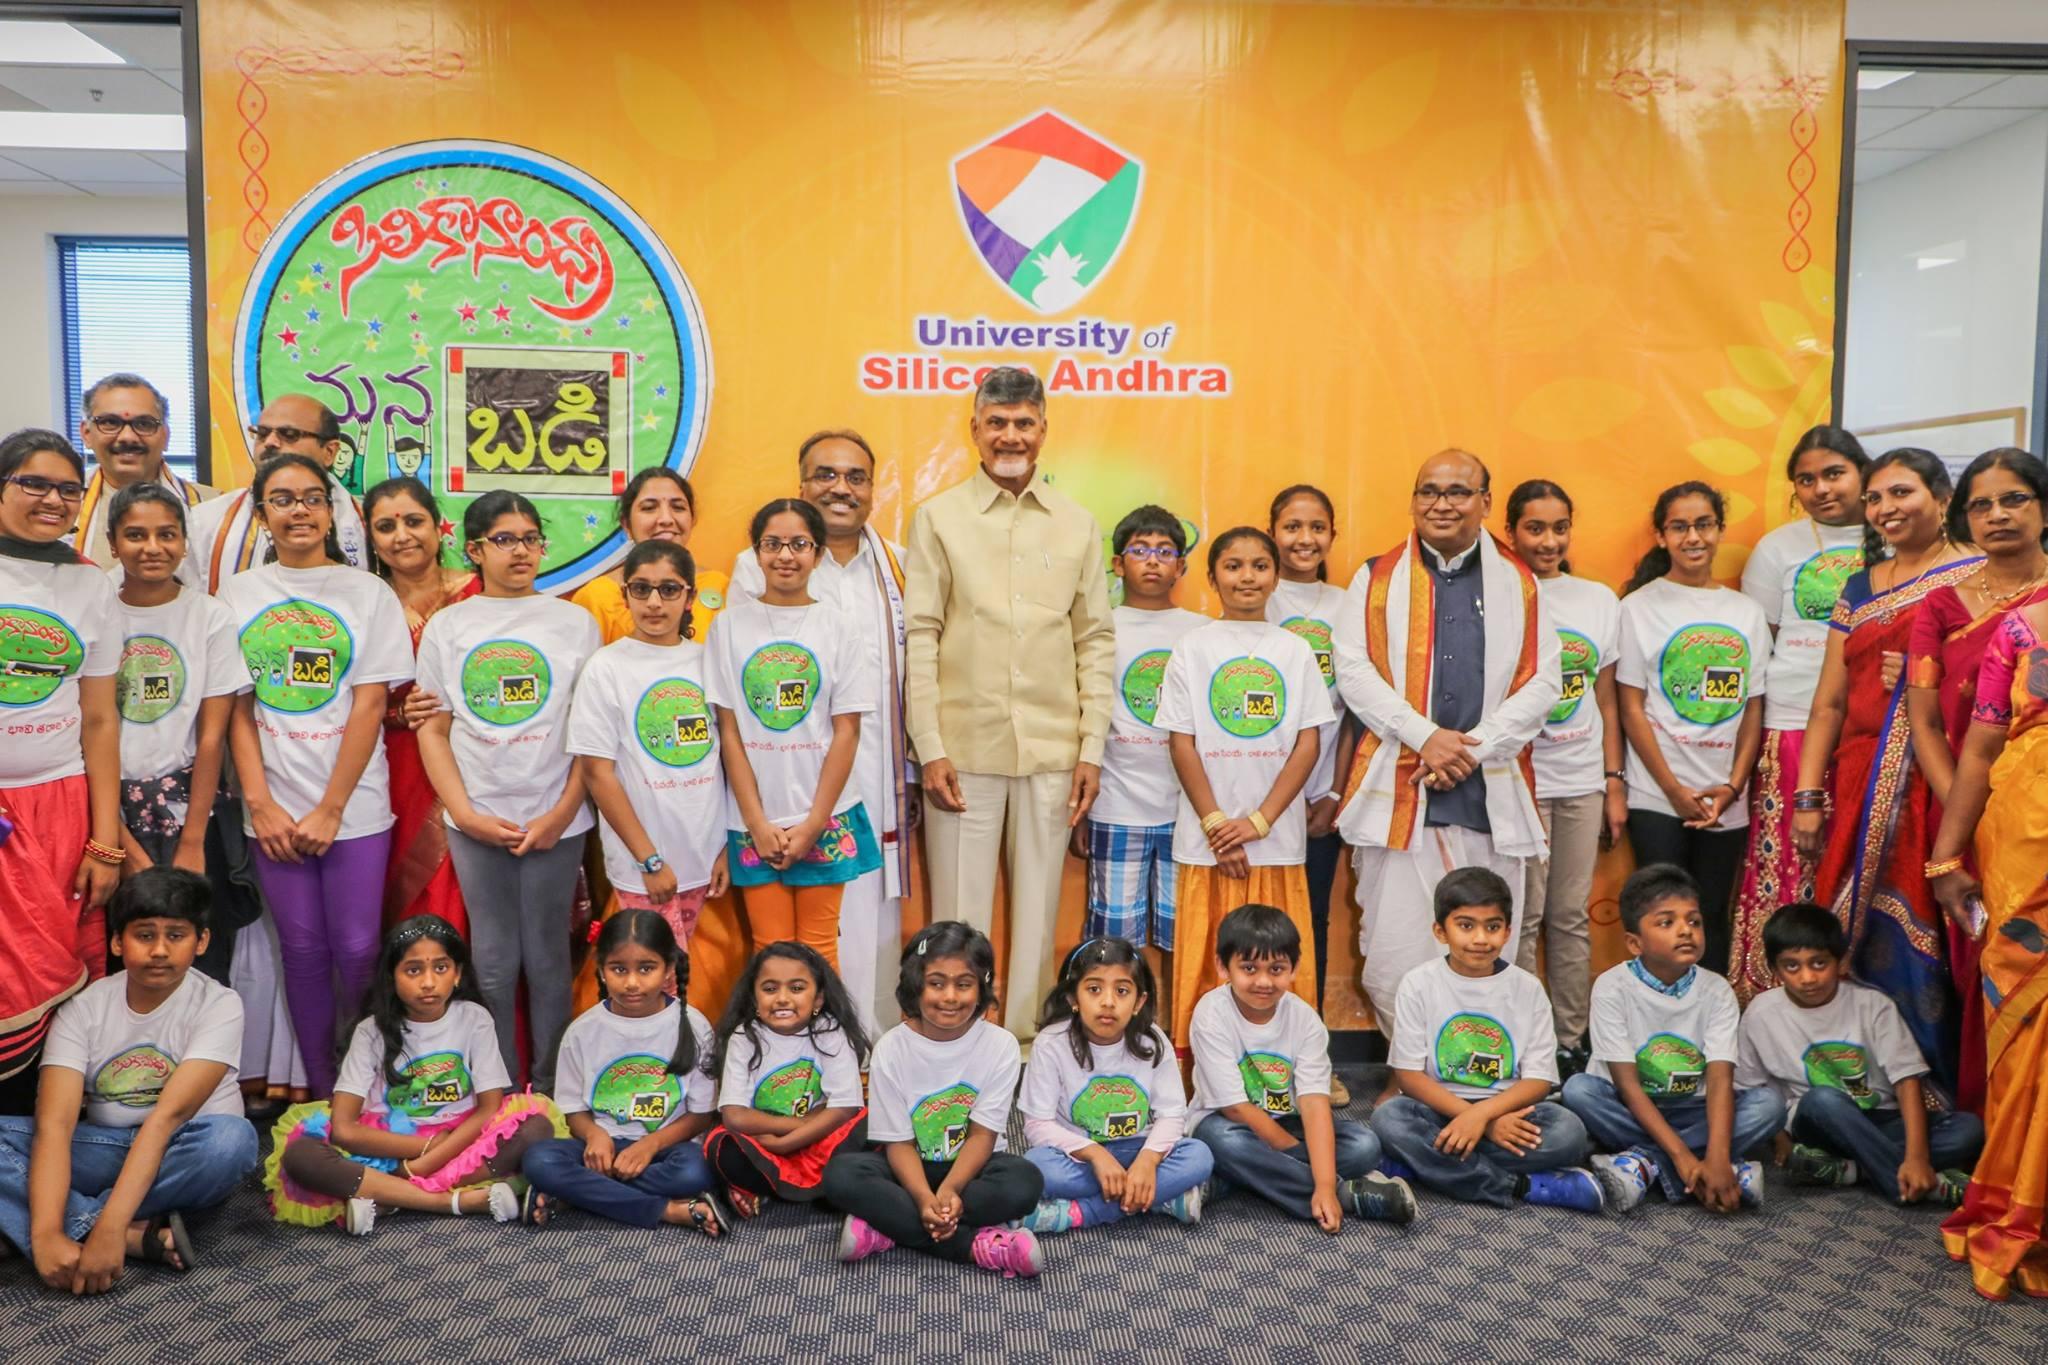 Andhra Pradesh chief minister N Chandrababu Naidu at Silicon Andhra University in Milpitas, California meeting people from Telugu community.